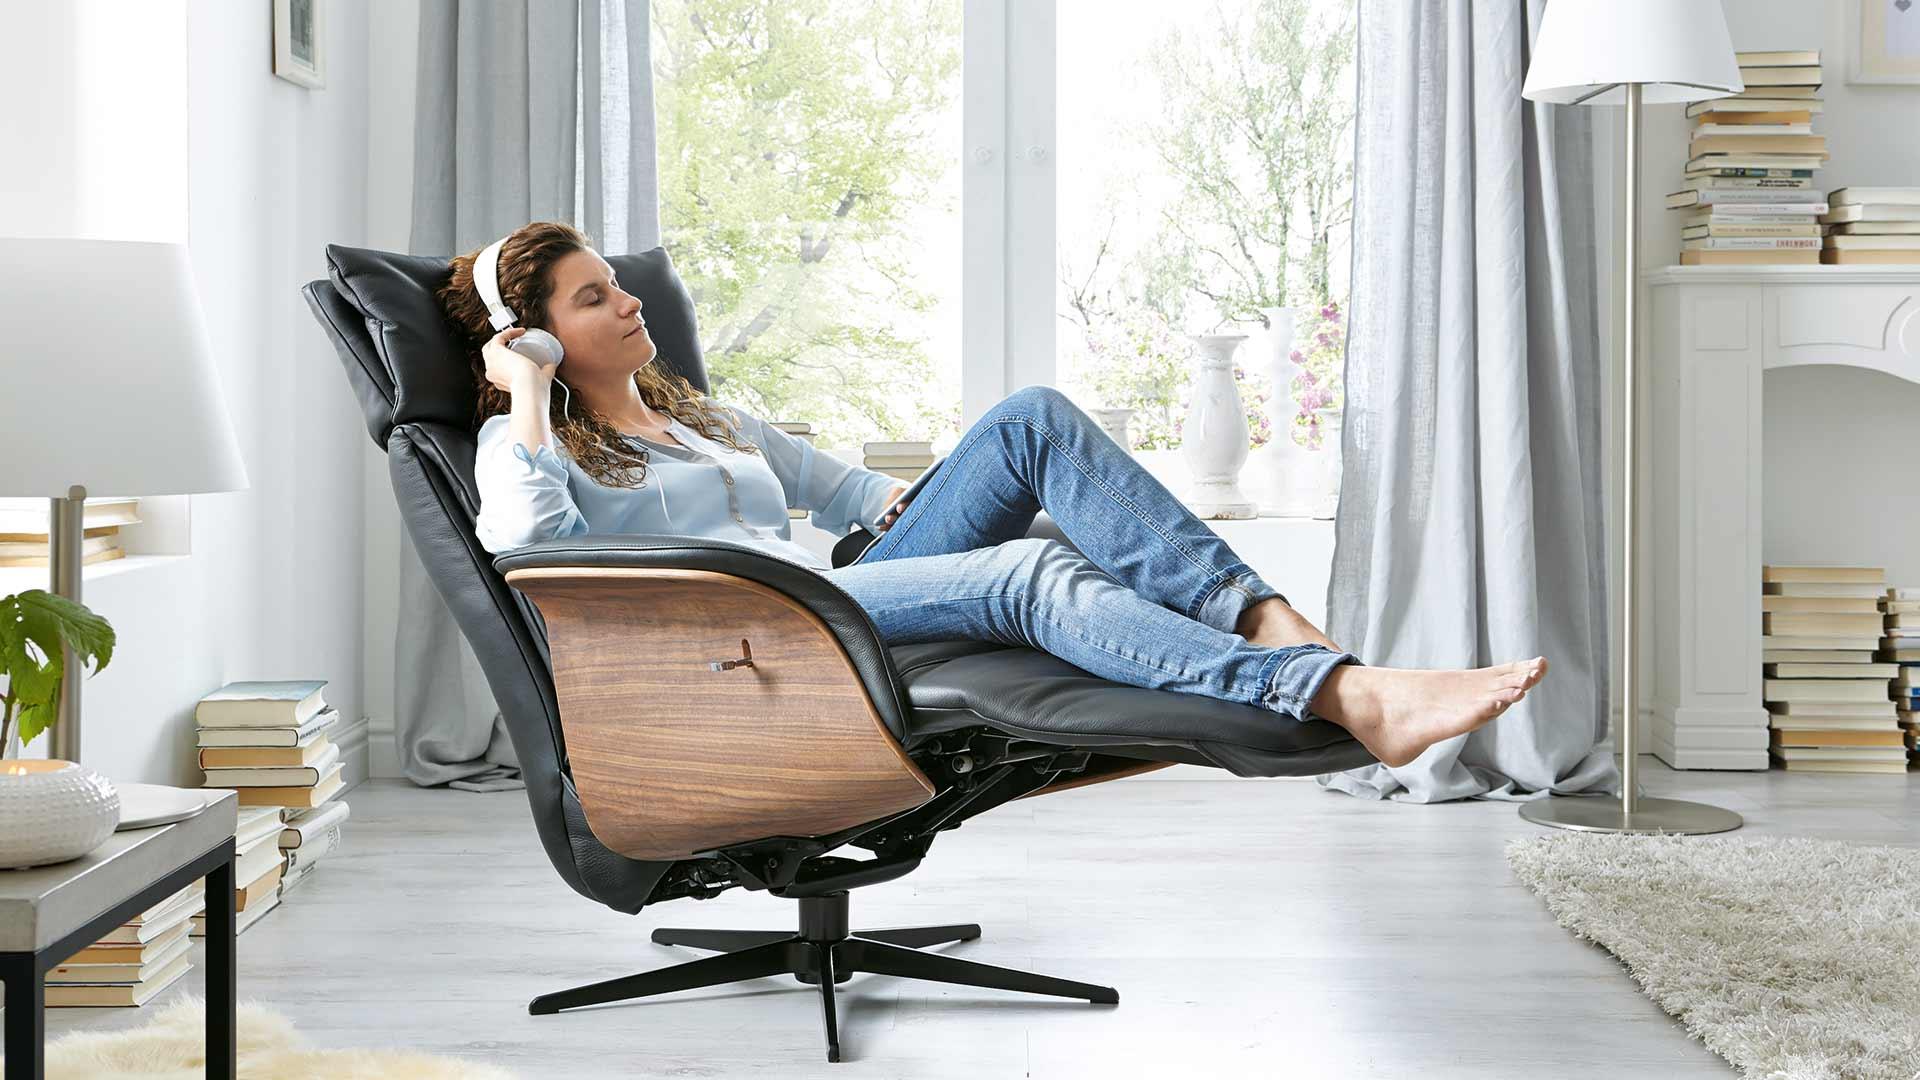 mbel garbsen cheap nolte venta stilvolle designkche in uform with mbel garbsen perfect nolte. Black Bedroom Furniture Sets. Home Design Ideas